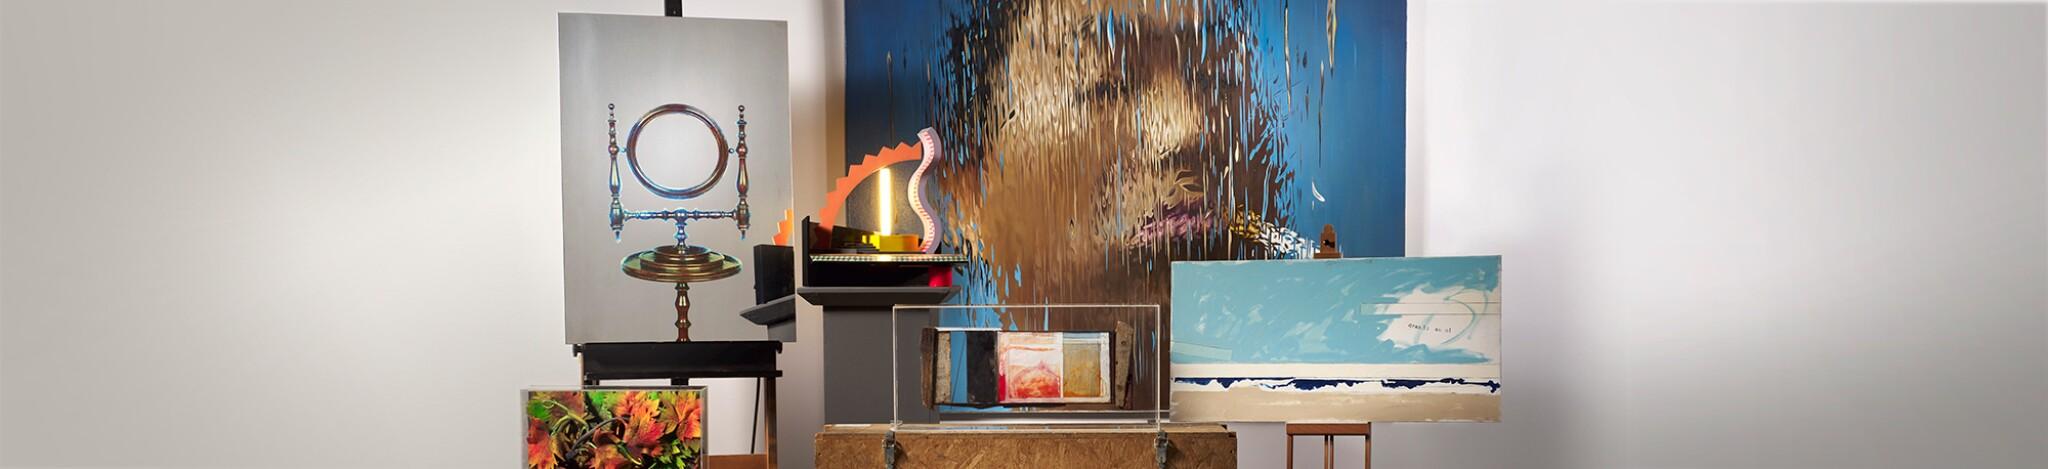 Contemporary Art Online ǀ Milan